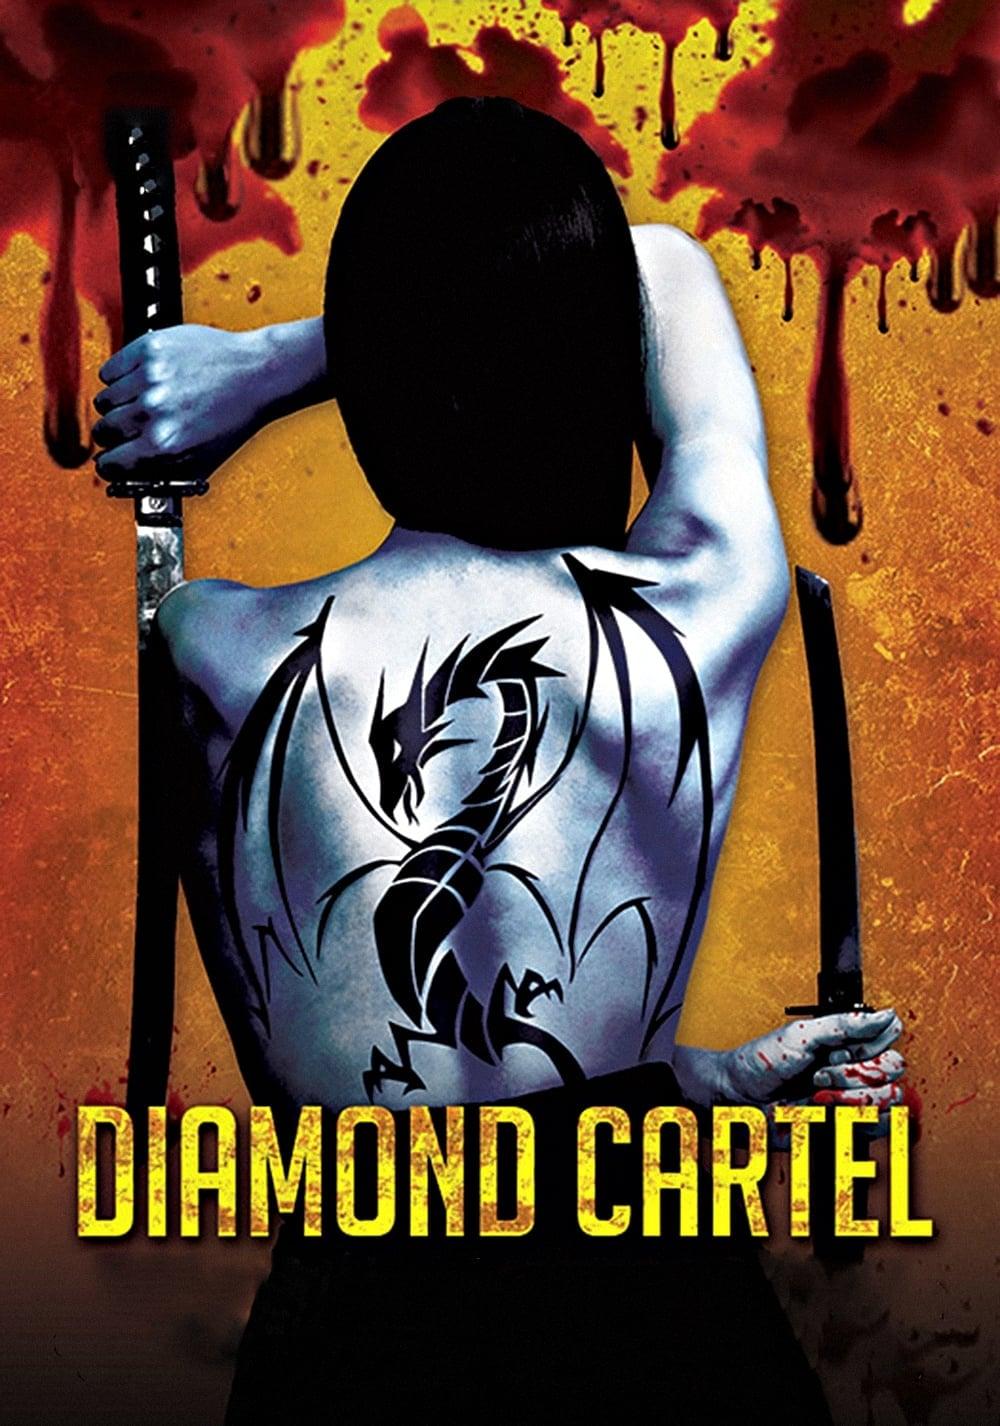 Diamond Cartel (2015)